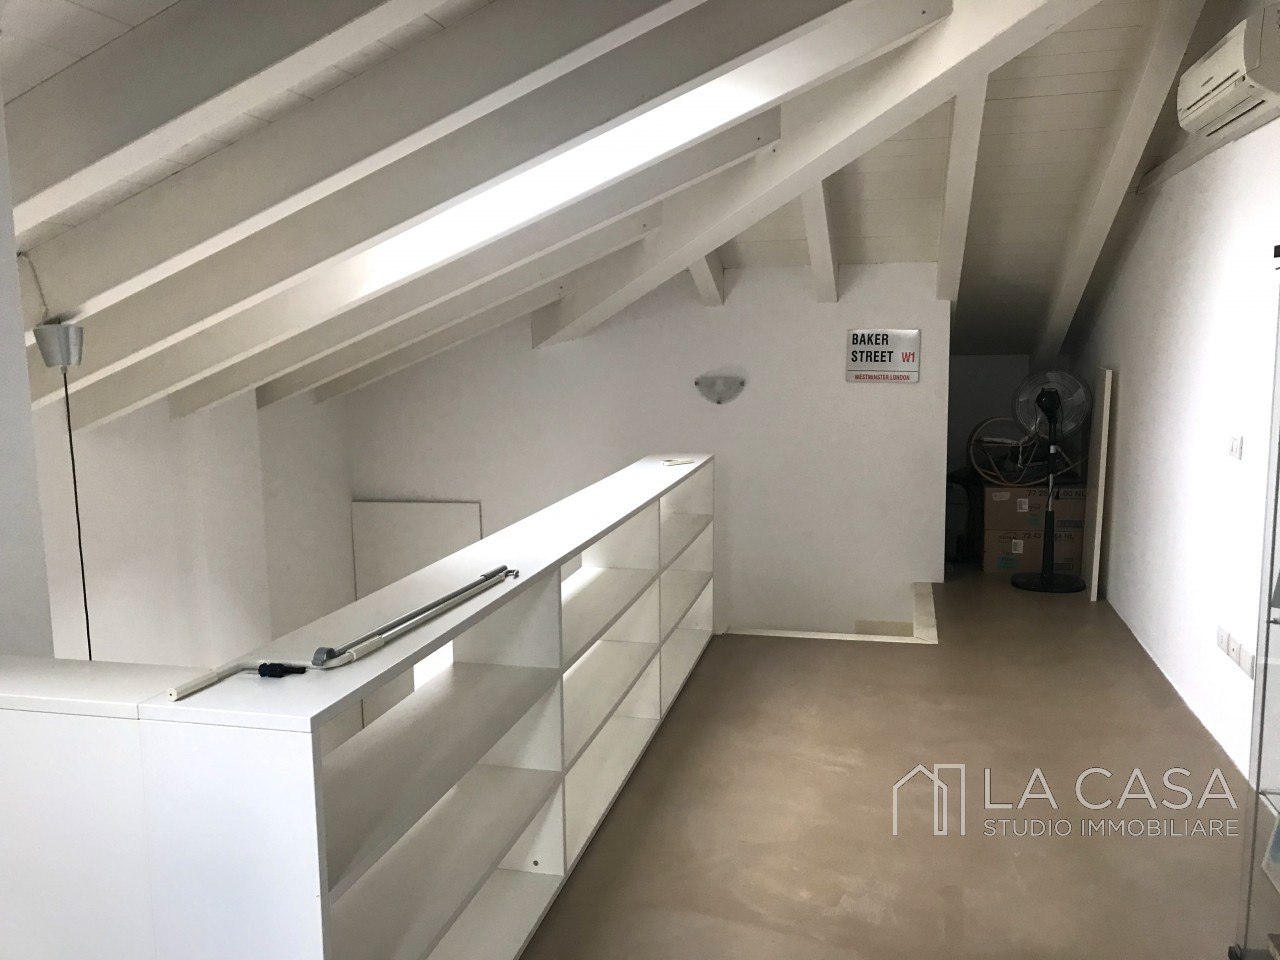 Loft in vendita a Borgomeduna di Pordenone - L1 https://media.gestionaleimmobiliare.it/foto/annunci/191202/2118232/1280x1280/006__img_1614_wmk_0.jpg